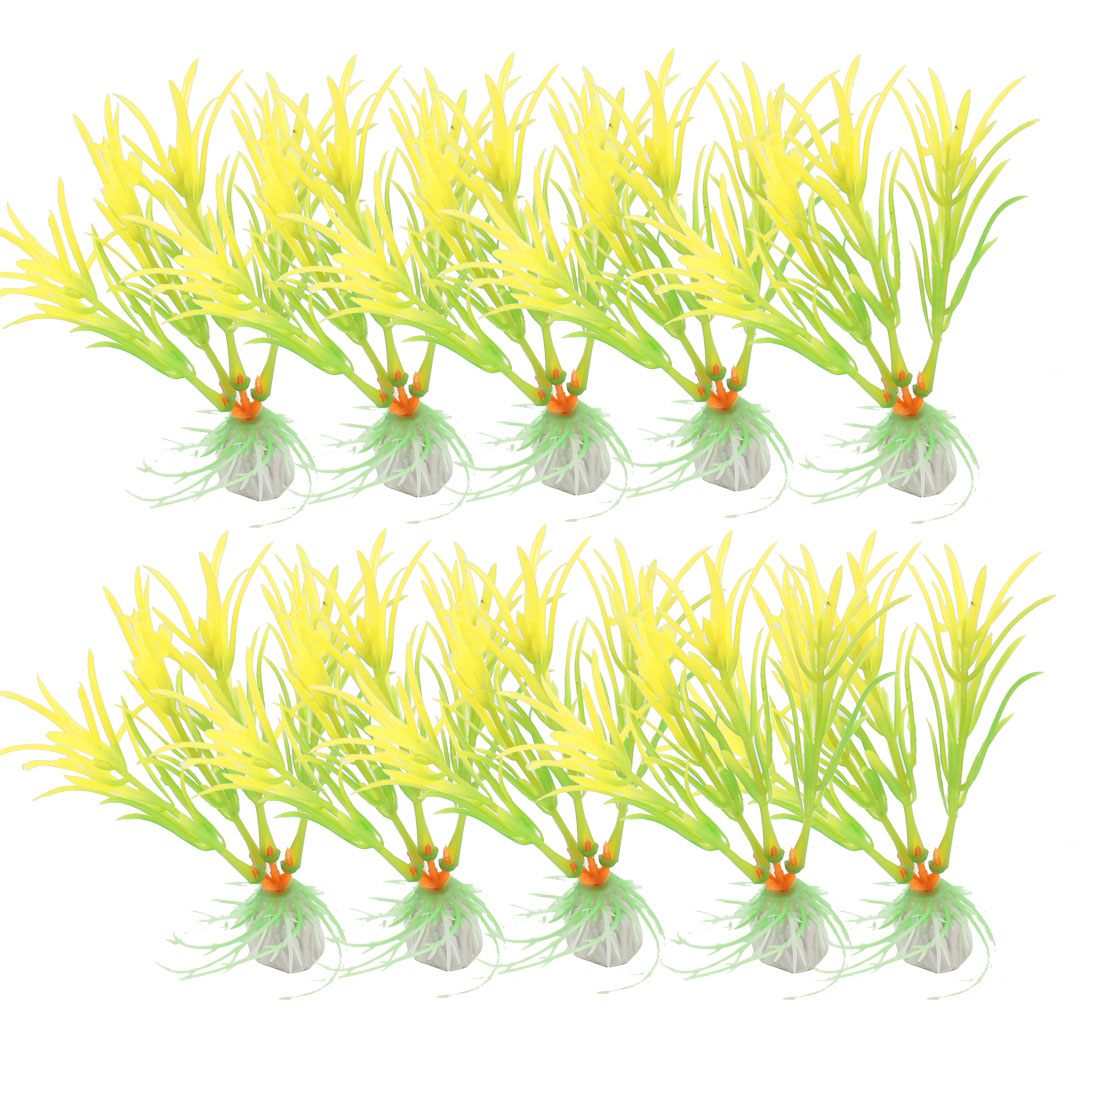 "4.3"" Height Green Yellow Plastic Grass Adorning Fish Aquarium Landscape 10 Pcs"